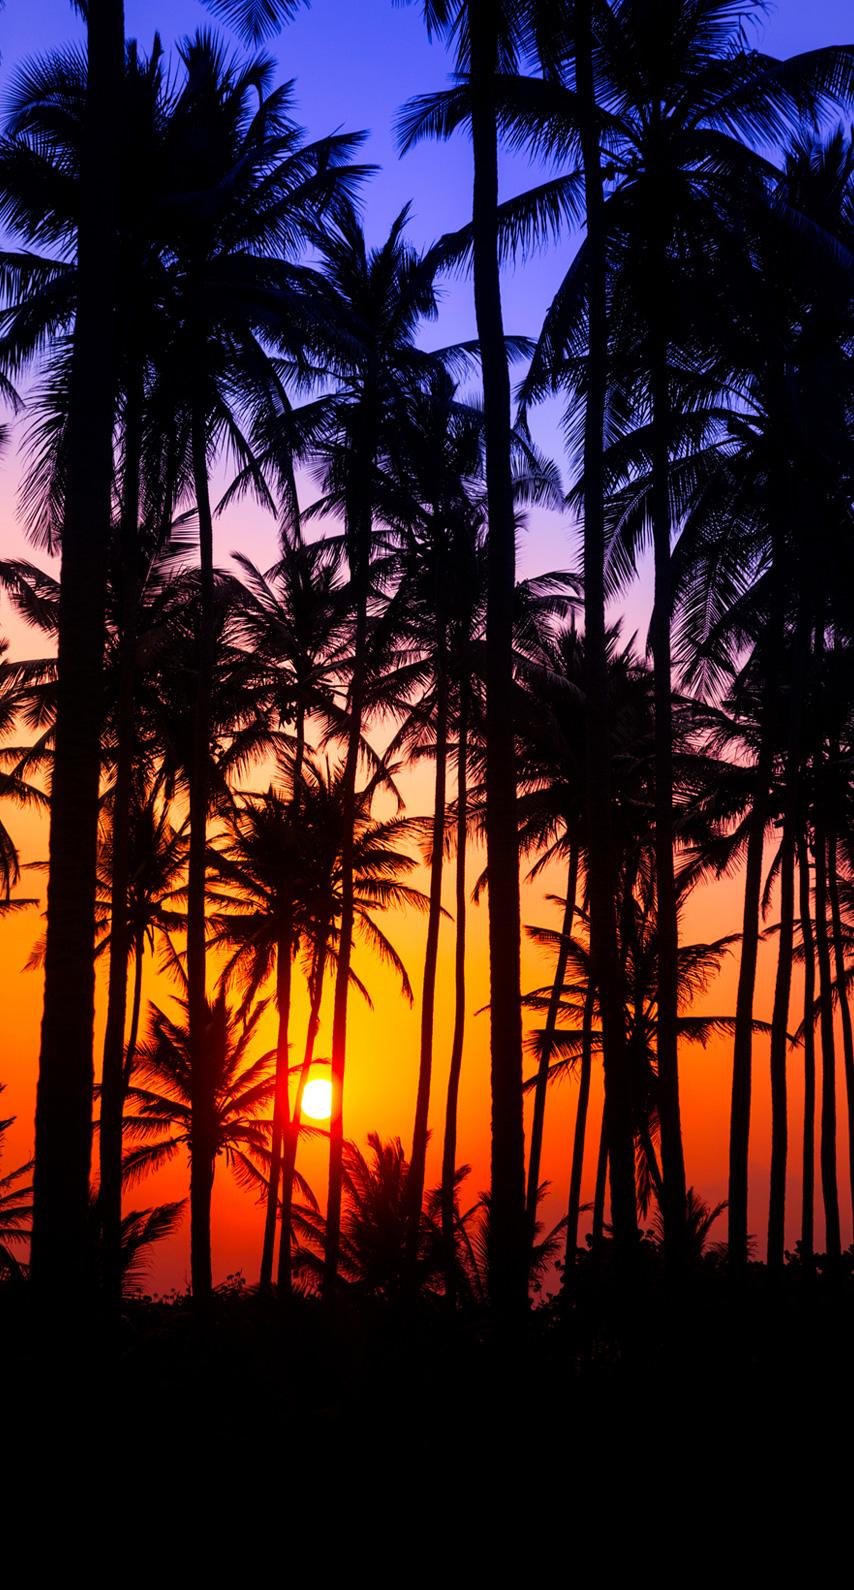 dawn, dusk